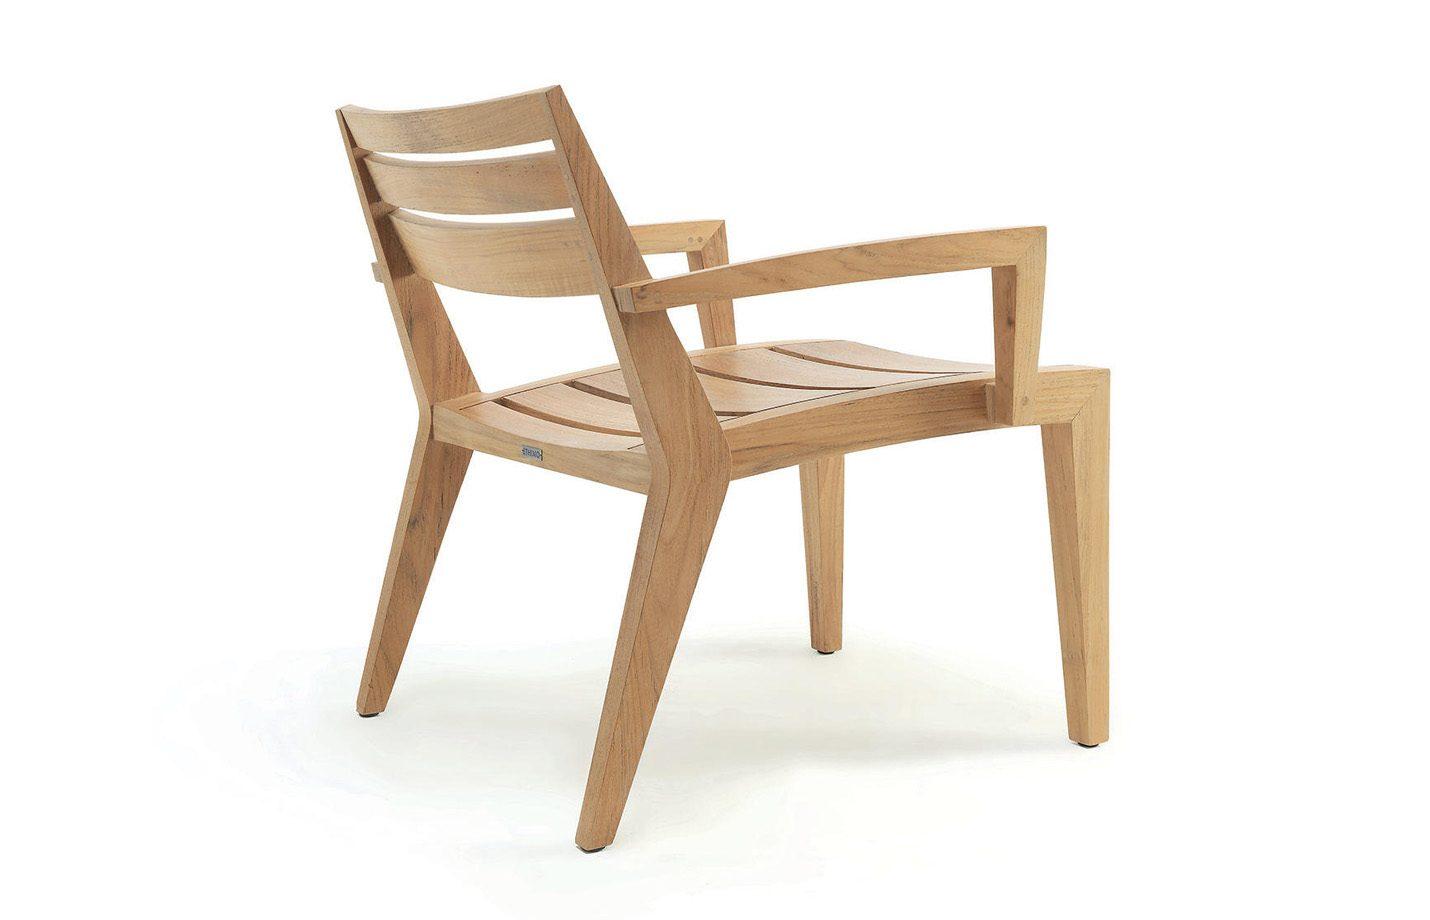 Ribot-Lounge-armchair-teak-03